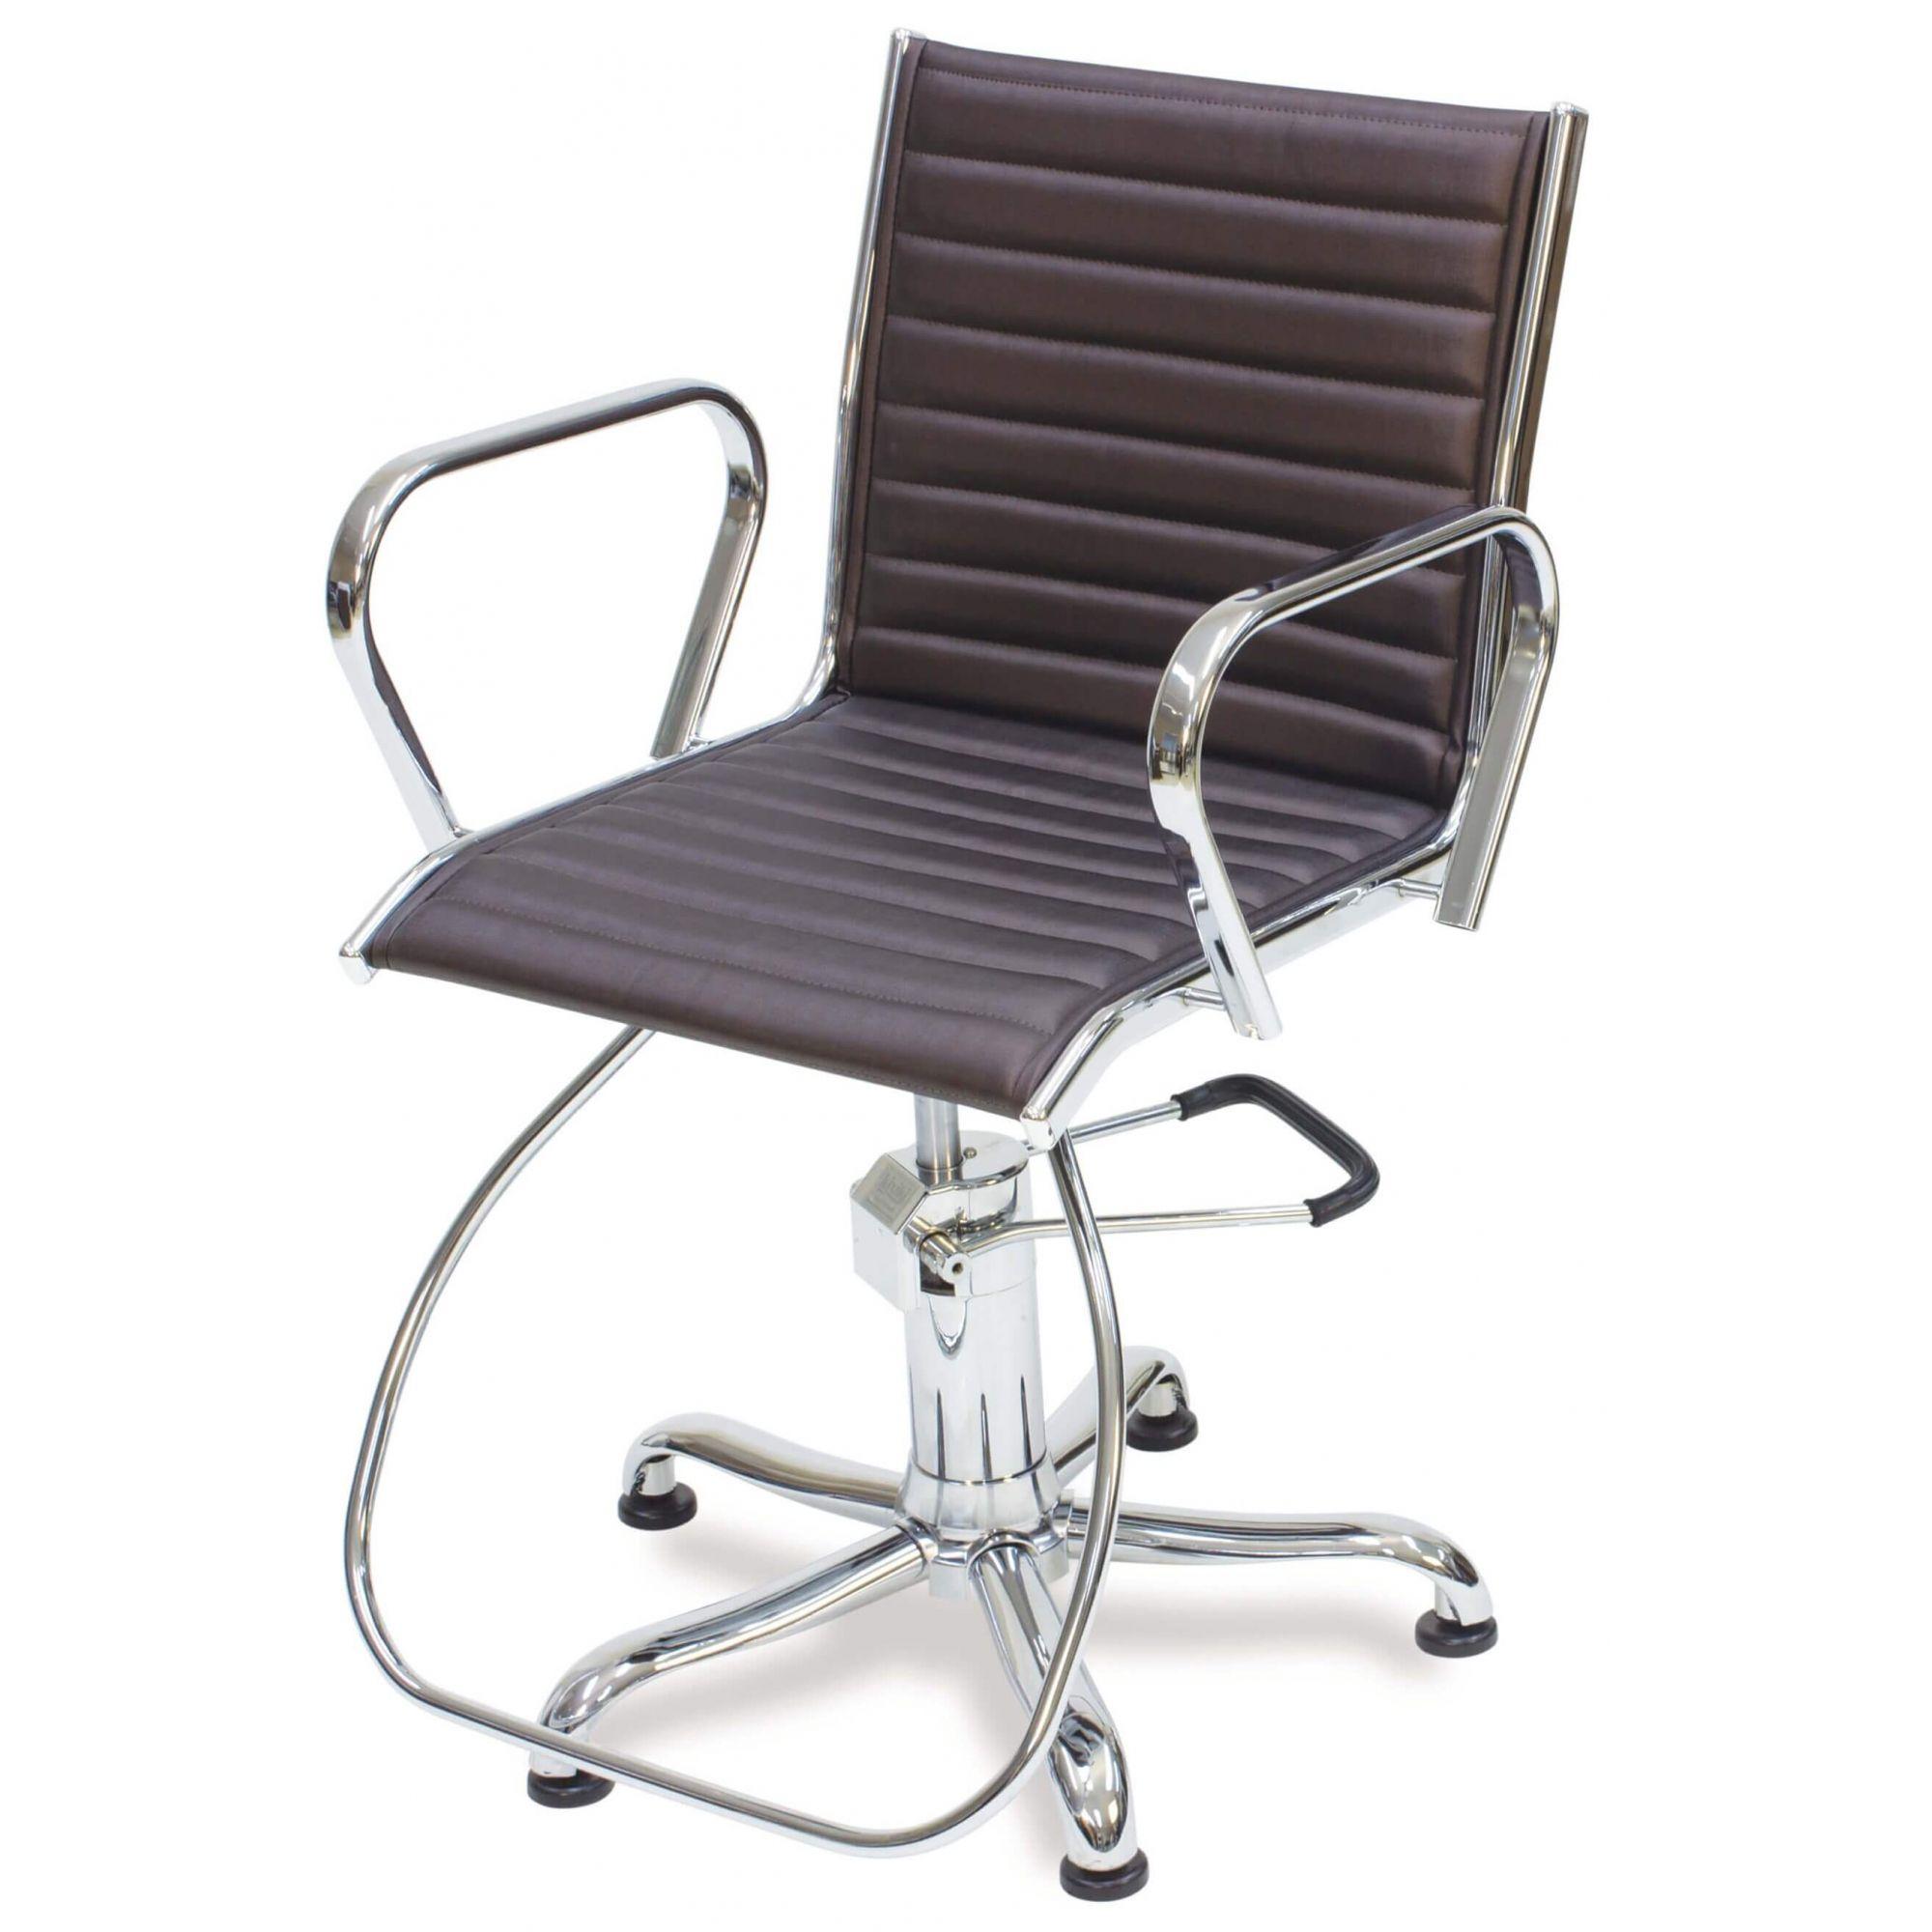 Cadeira Encosto Fixo Sem Cabeçote - Atenas Kixiki